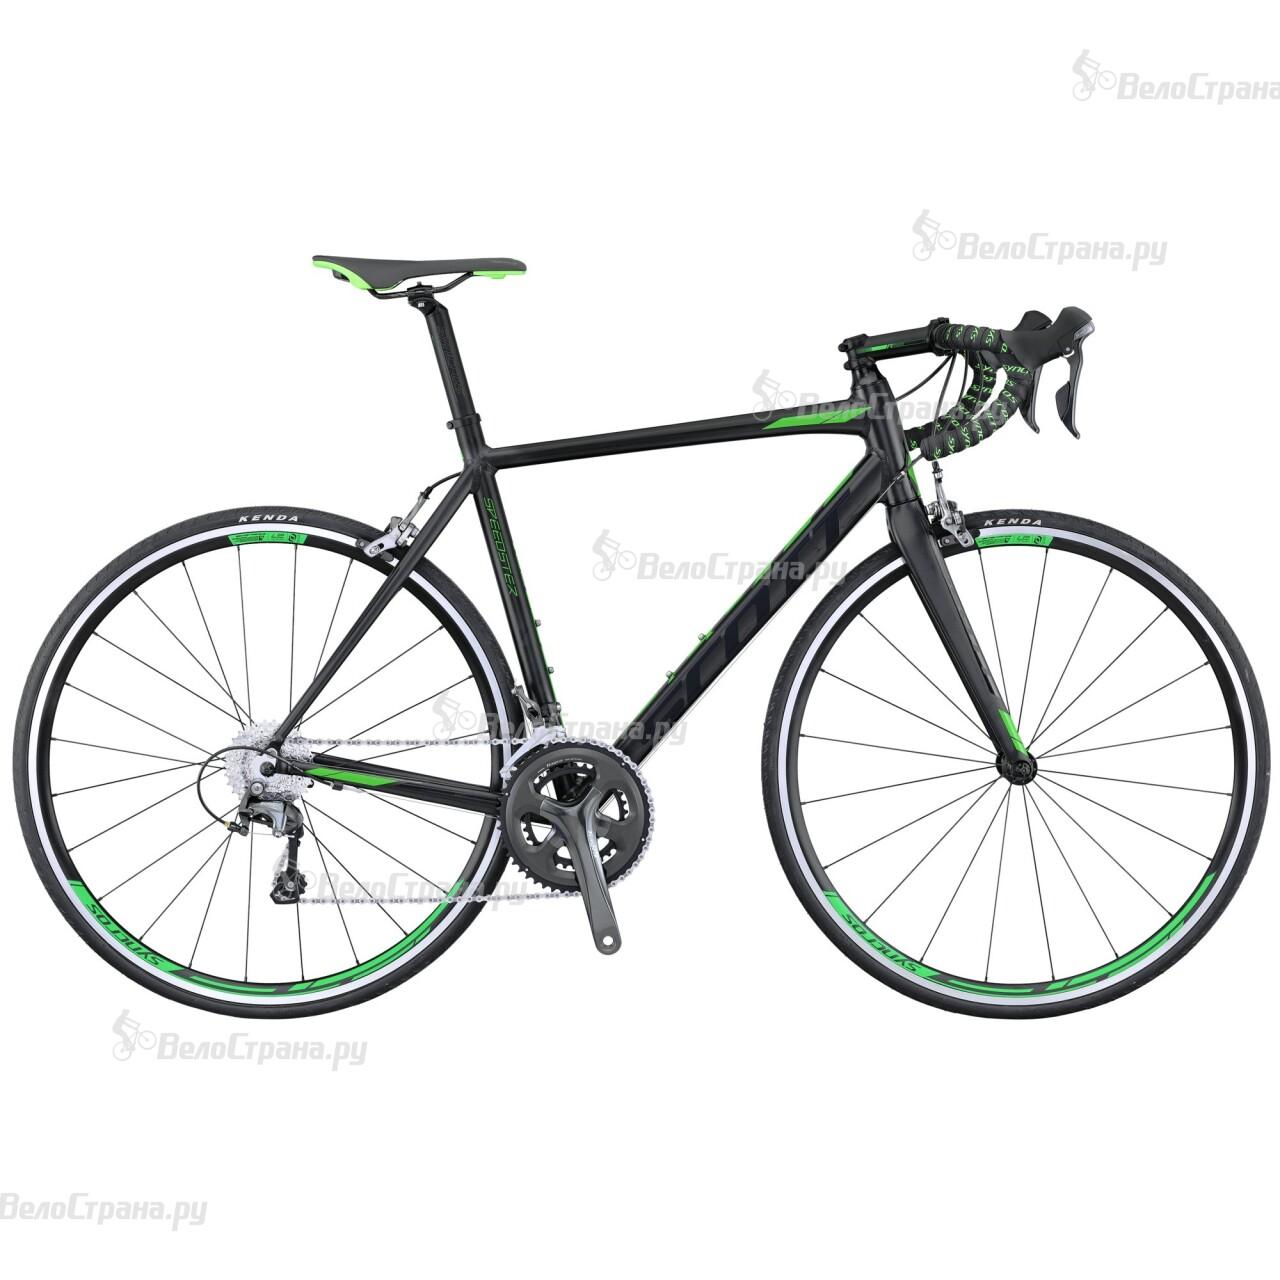 Велосипед Scott Speedster 30 Compact (2016) велосипед scott speedster 30 disc 2016